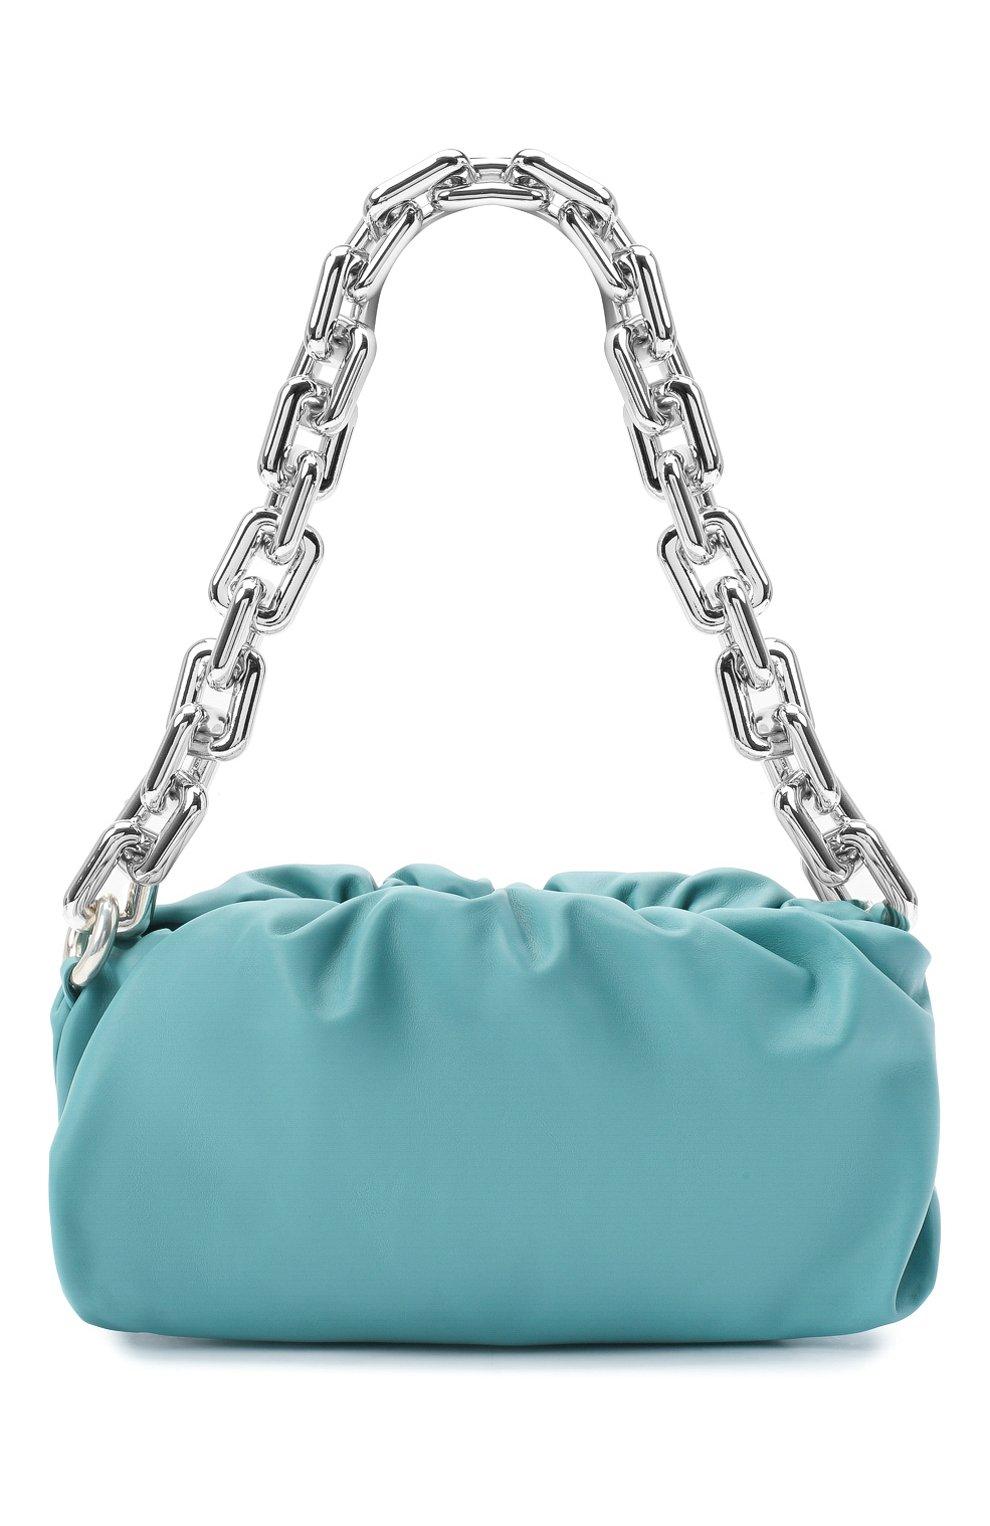 Женская сумка chain pouch BOTTEGA VENETA голубого цвета, арт. 620230/VCP40   Фото 1